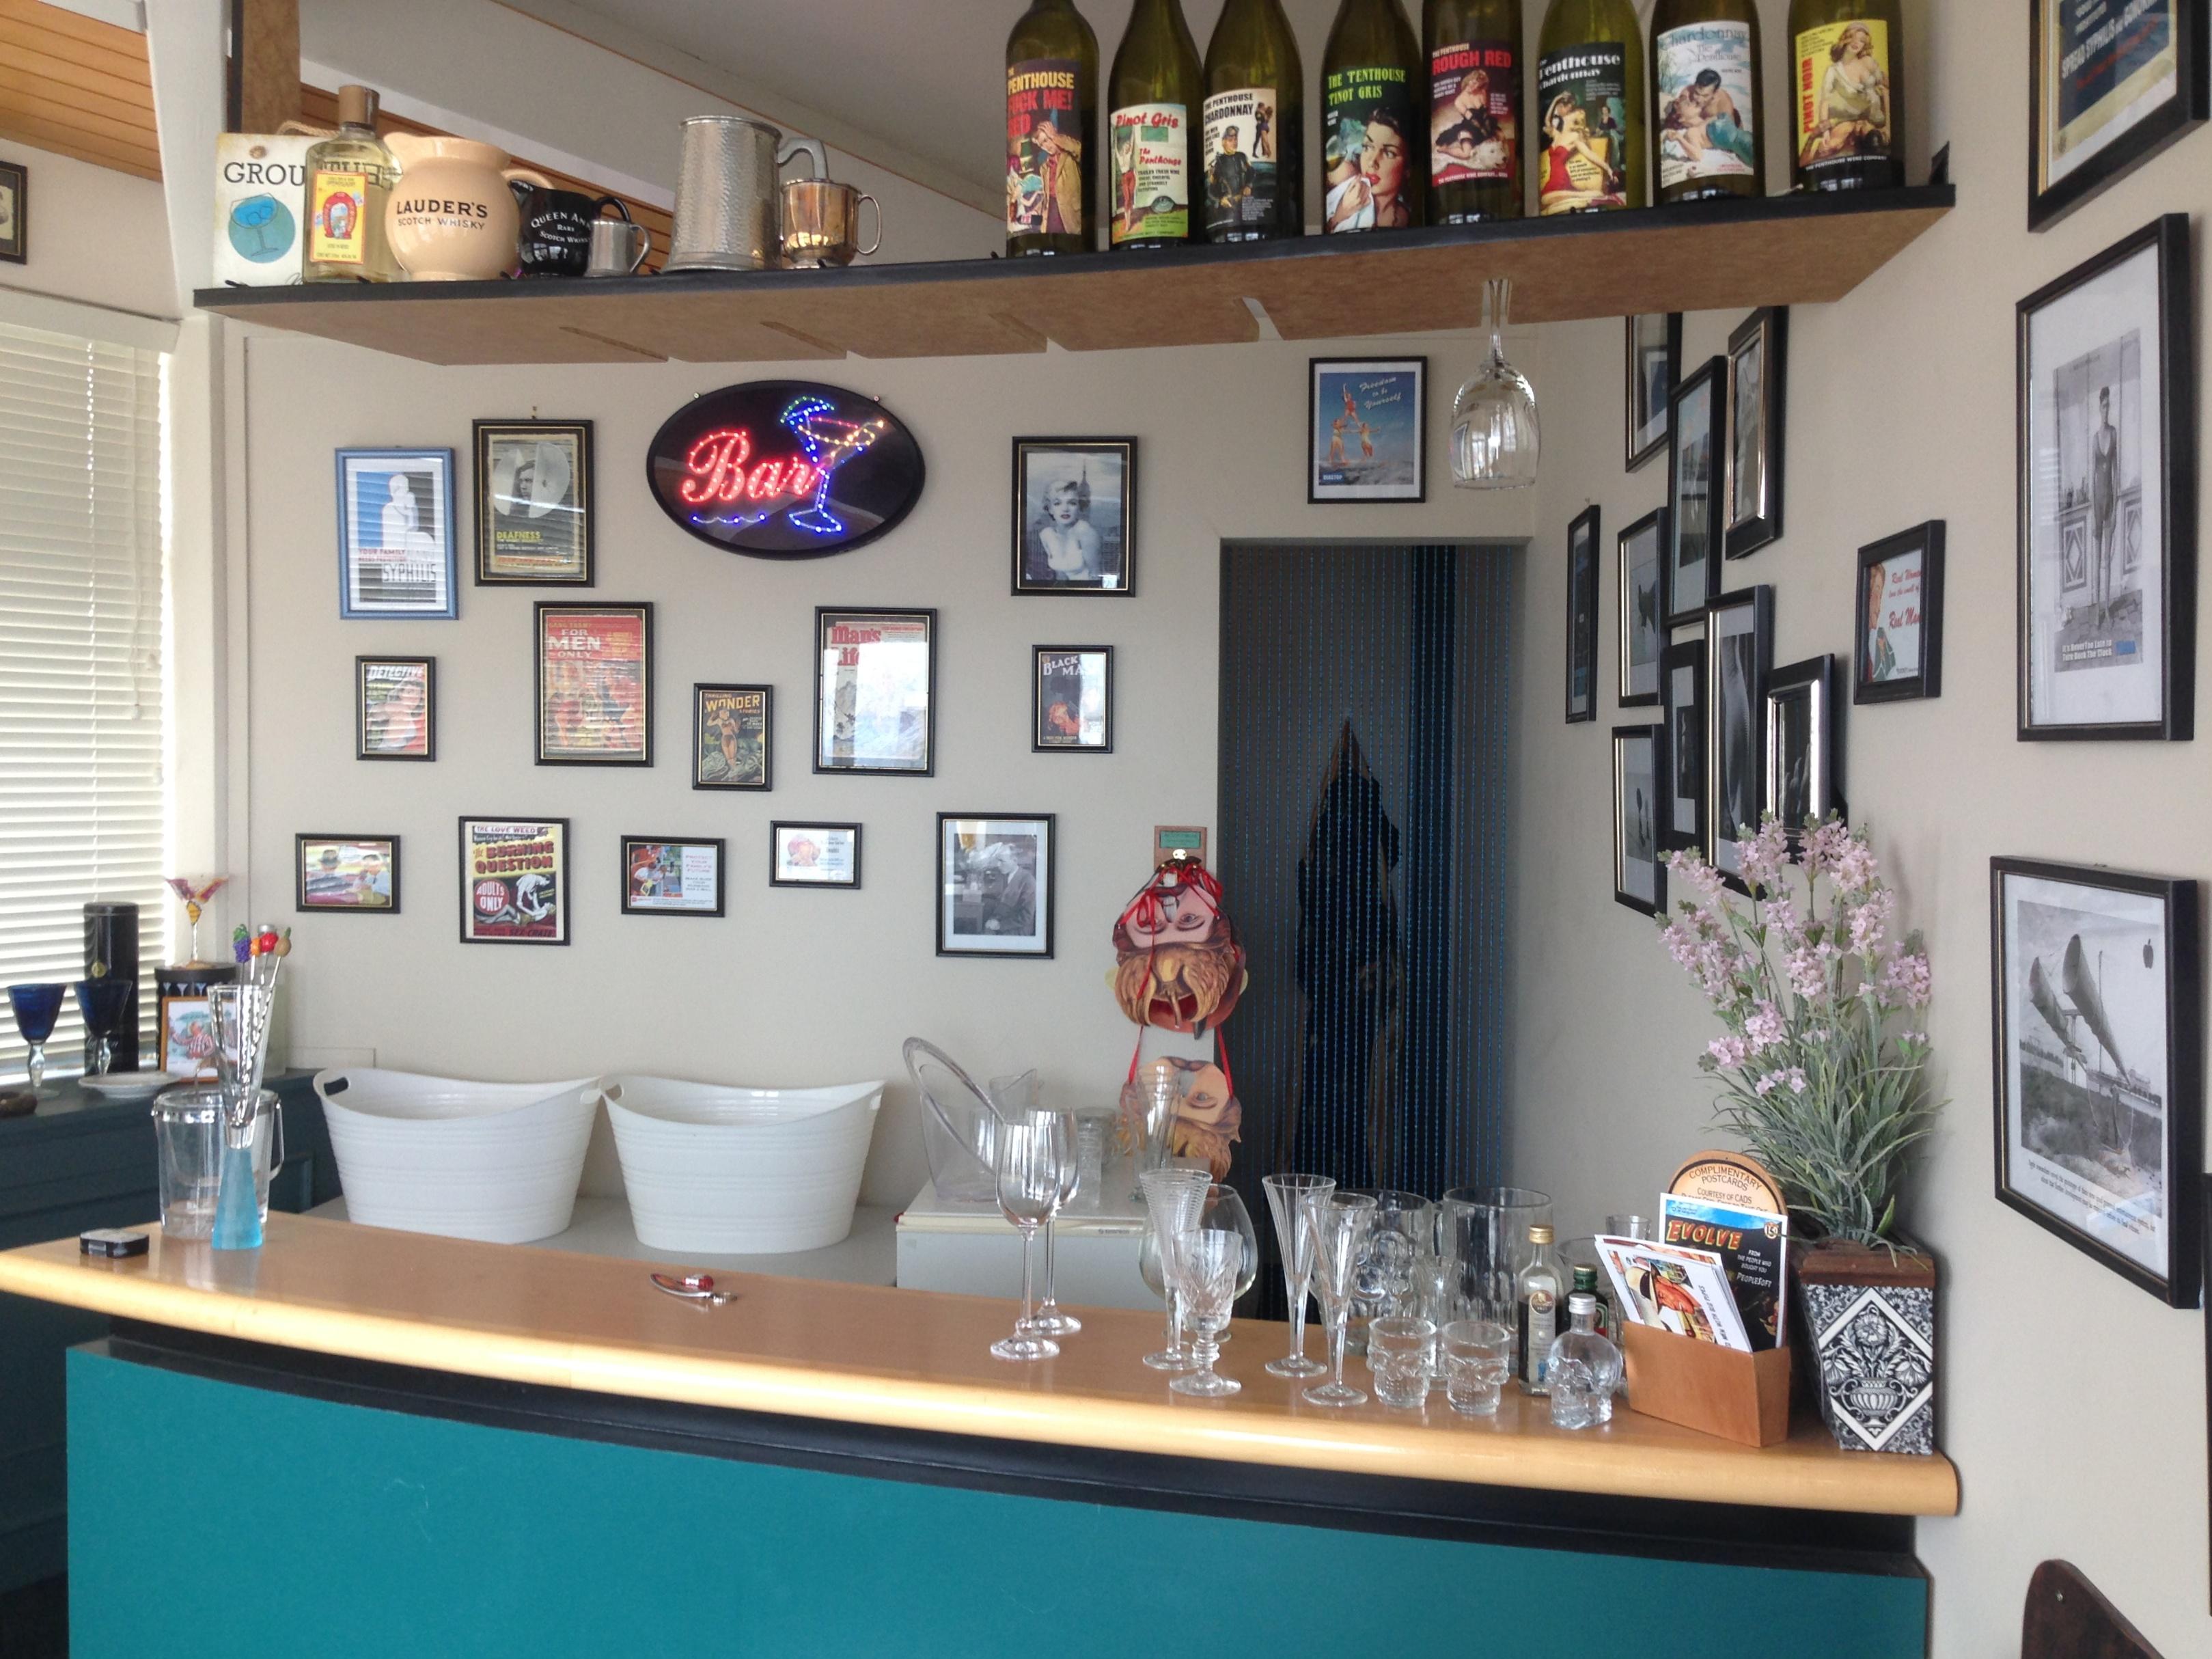 Bar intrieur maison meuble bar separation cuisine americaine luxe bar separation cuisine - Bar interieur maison ...